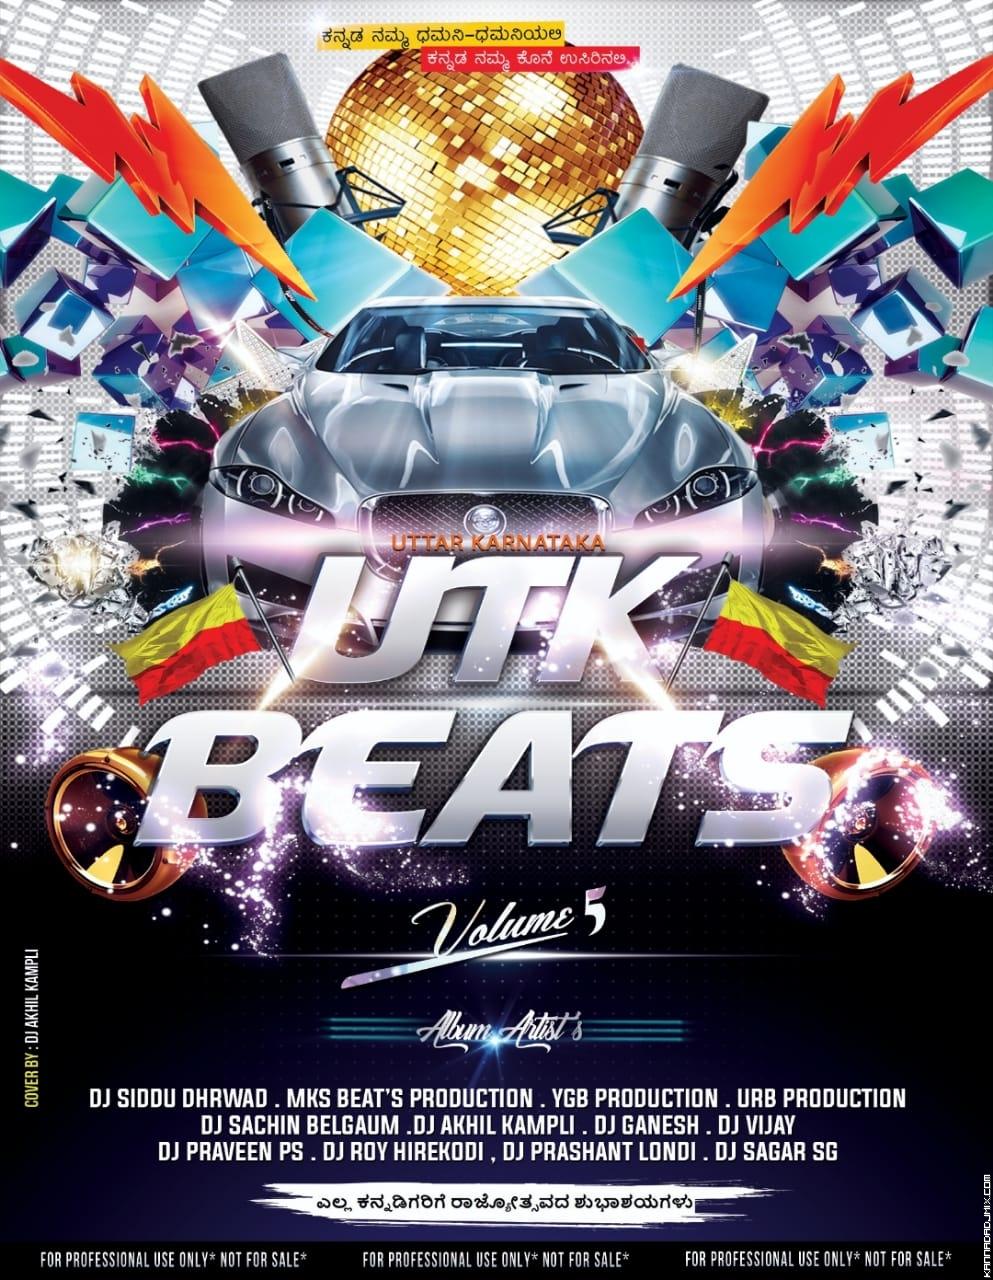 Avva Kano Kannada EDM DROP MIX  DJ PRAVEEN PS.mp3